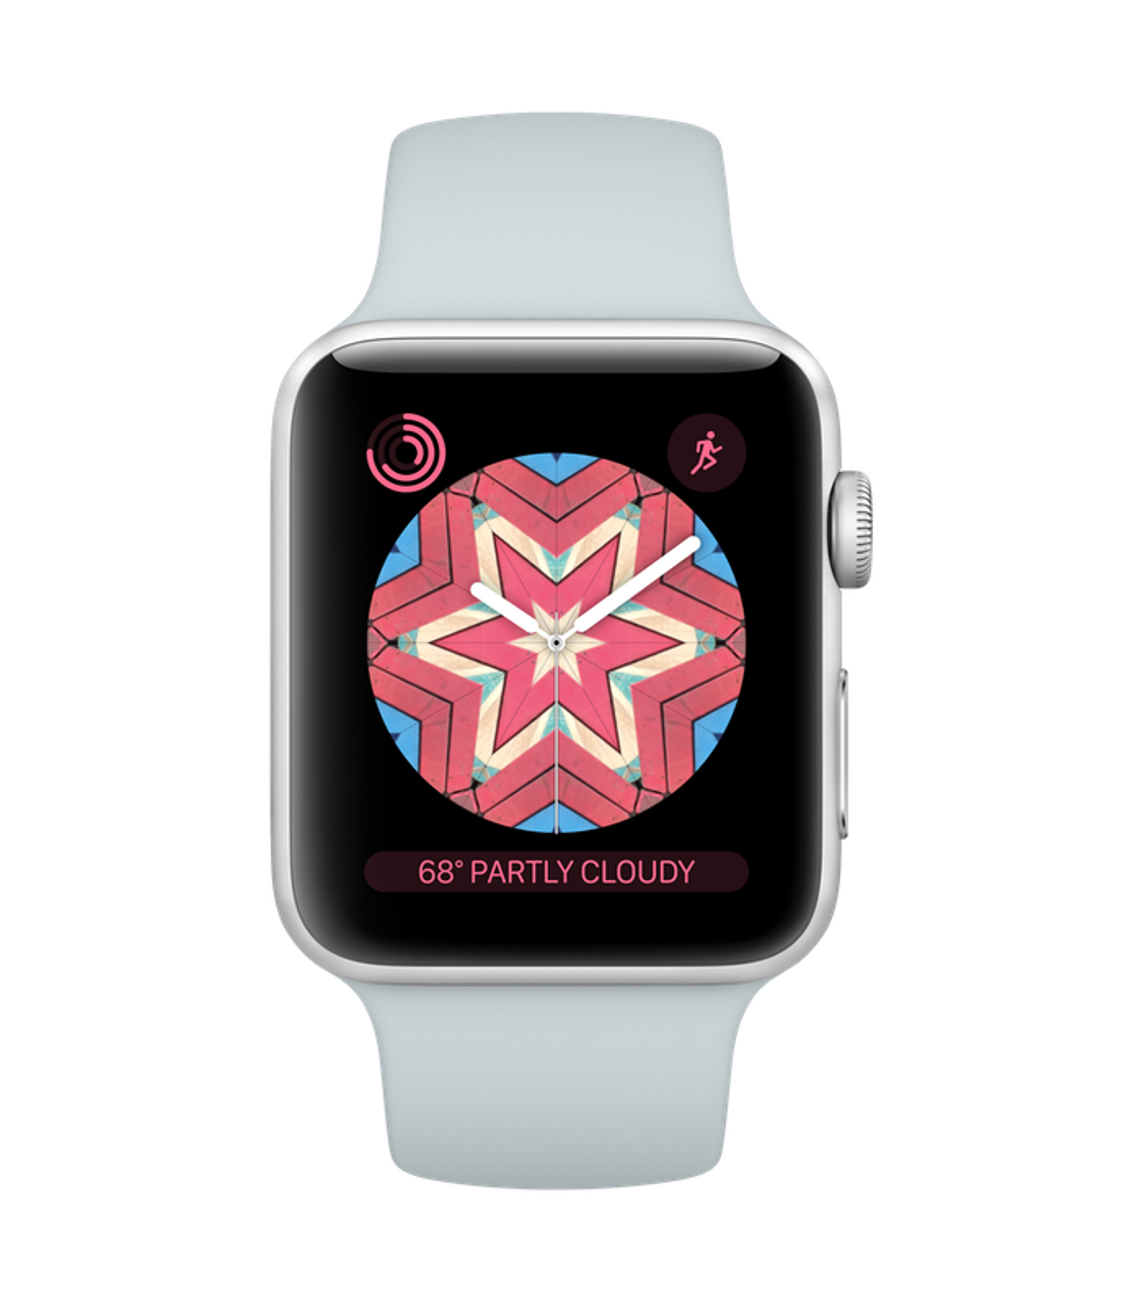 Kaleidoscope watch face